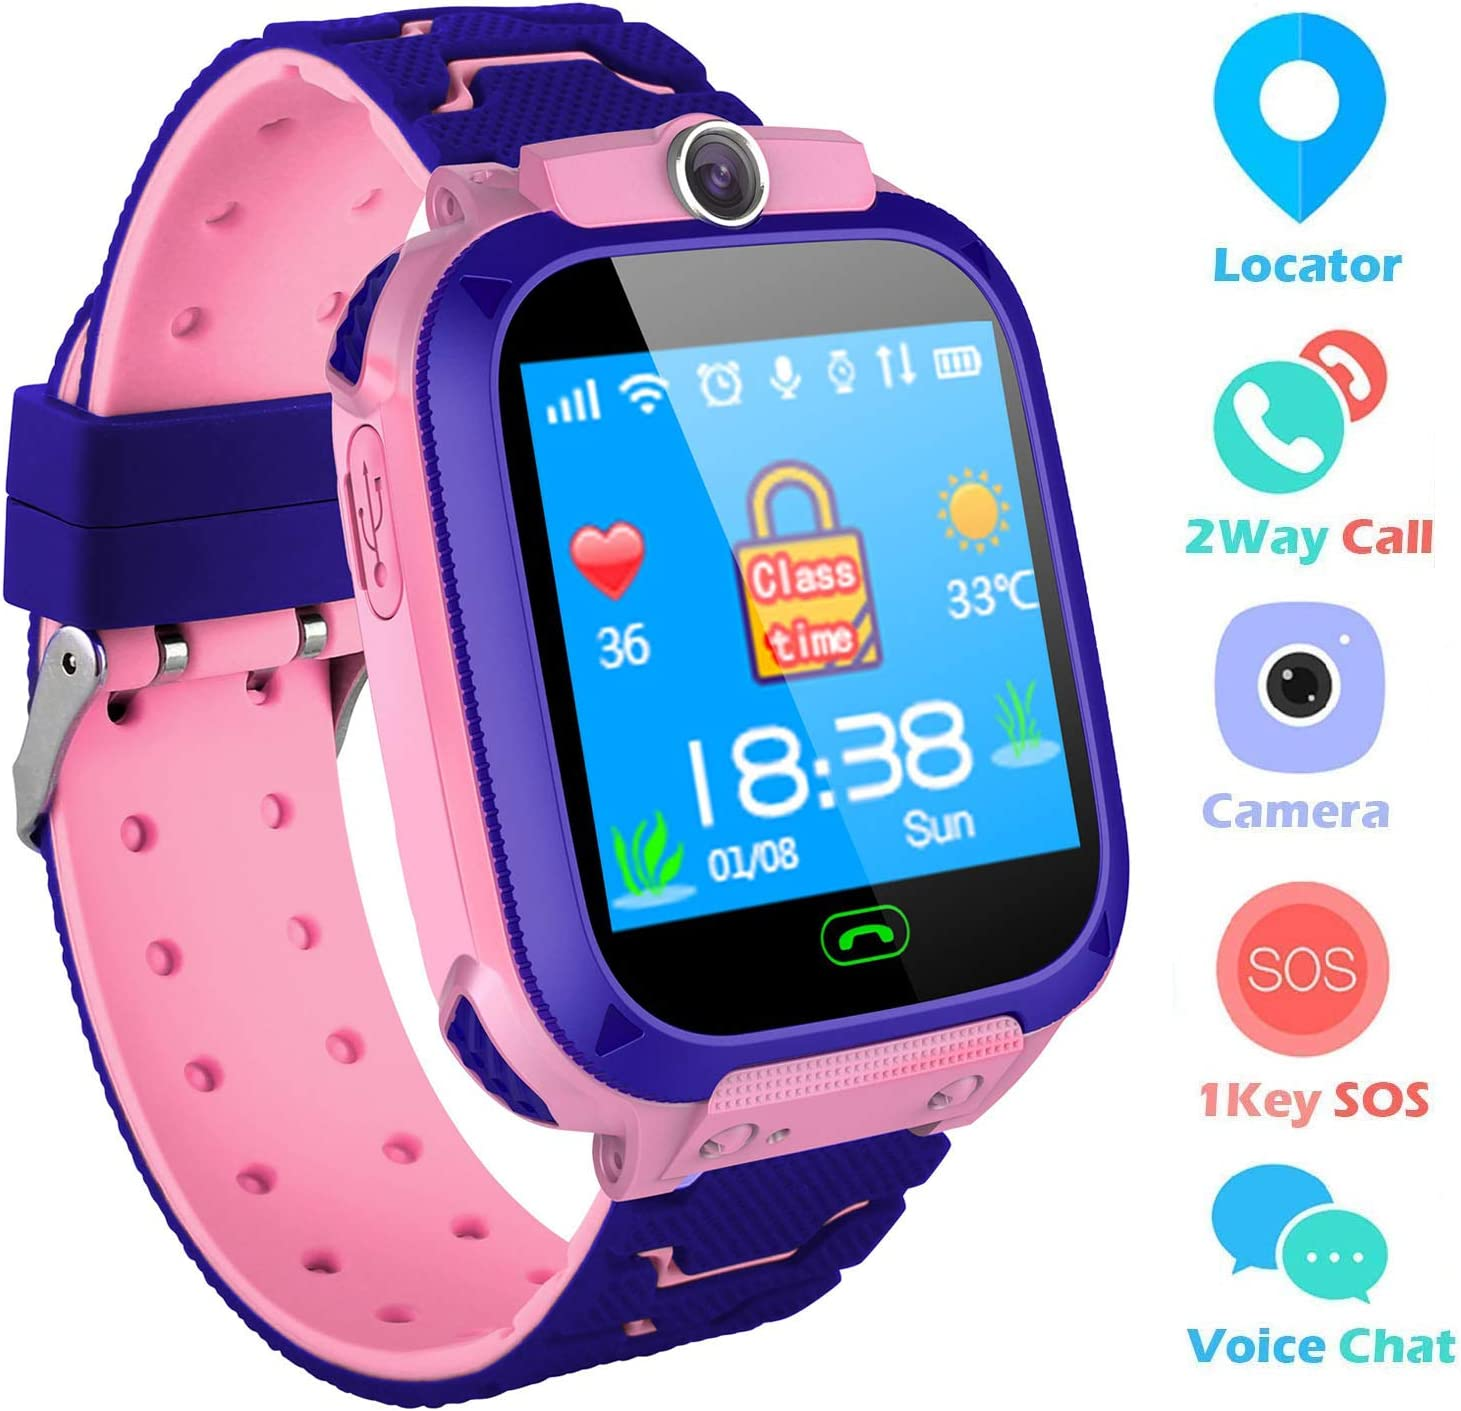 bhdlovely Reloj Niños Smartwatch LBS/GPS Pantalla Táctil Kids Safe Anti-Pérdida SOS para Android e iOS Smartphone